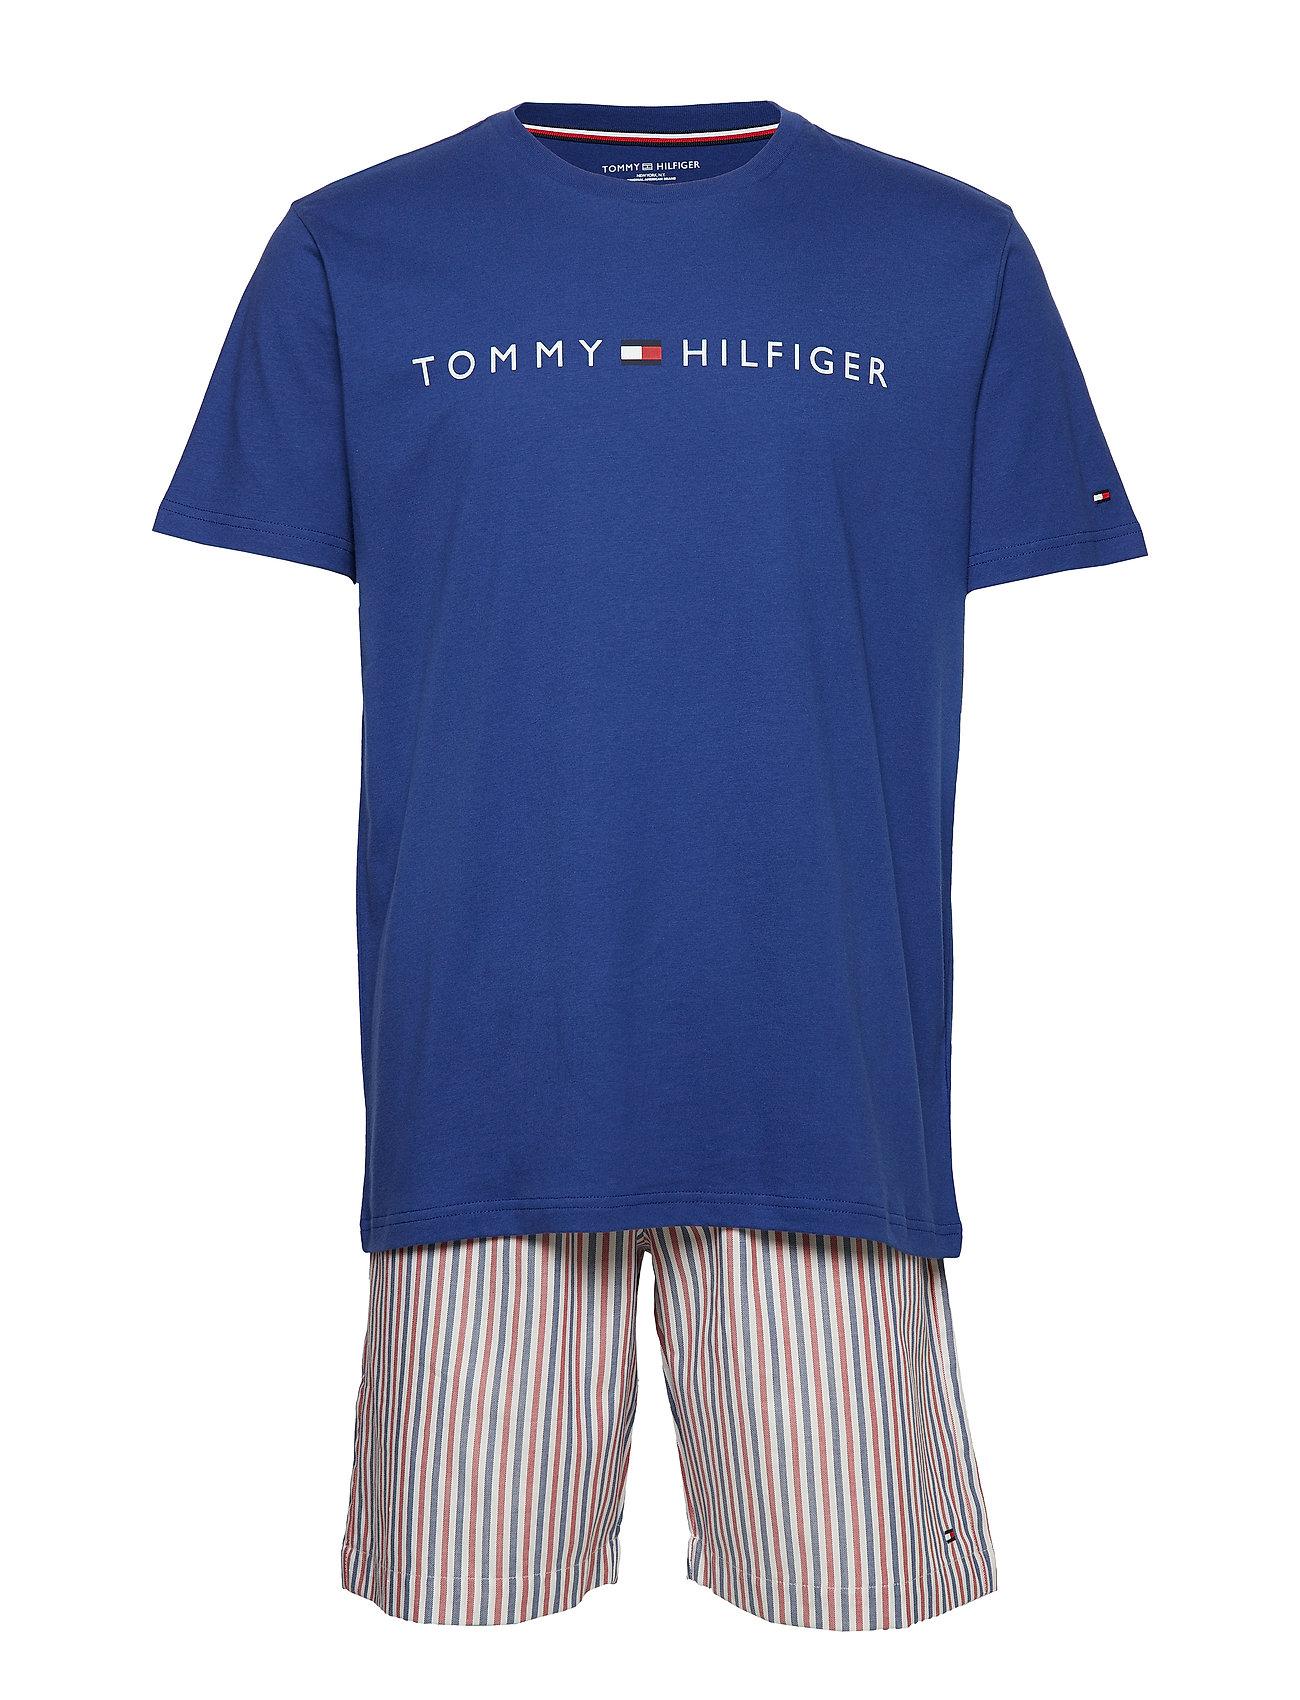 Tommy Hilfiger CN SS SHORT SET WOVEN PRINT - SODALITE BLUE